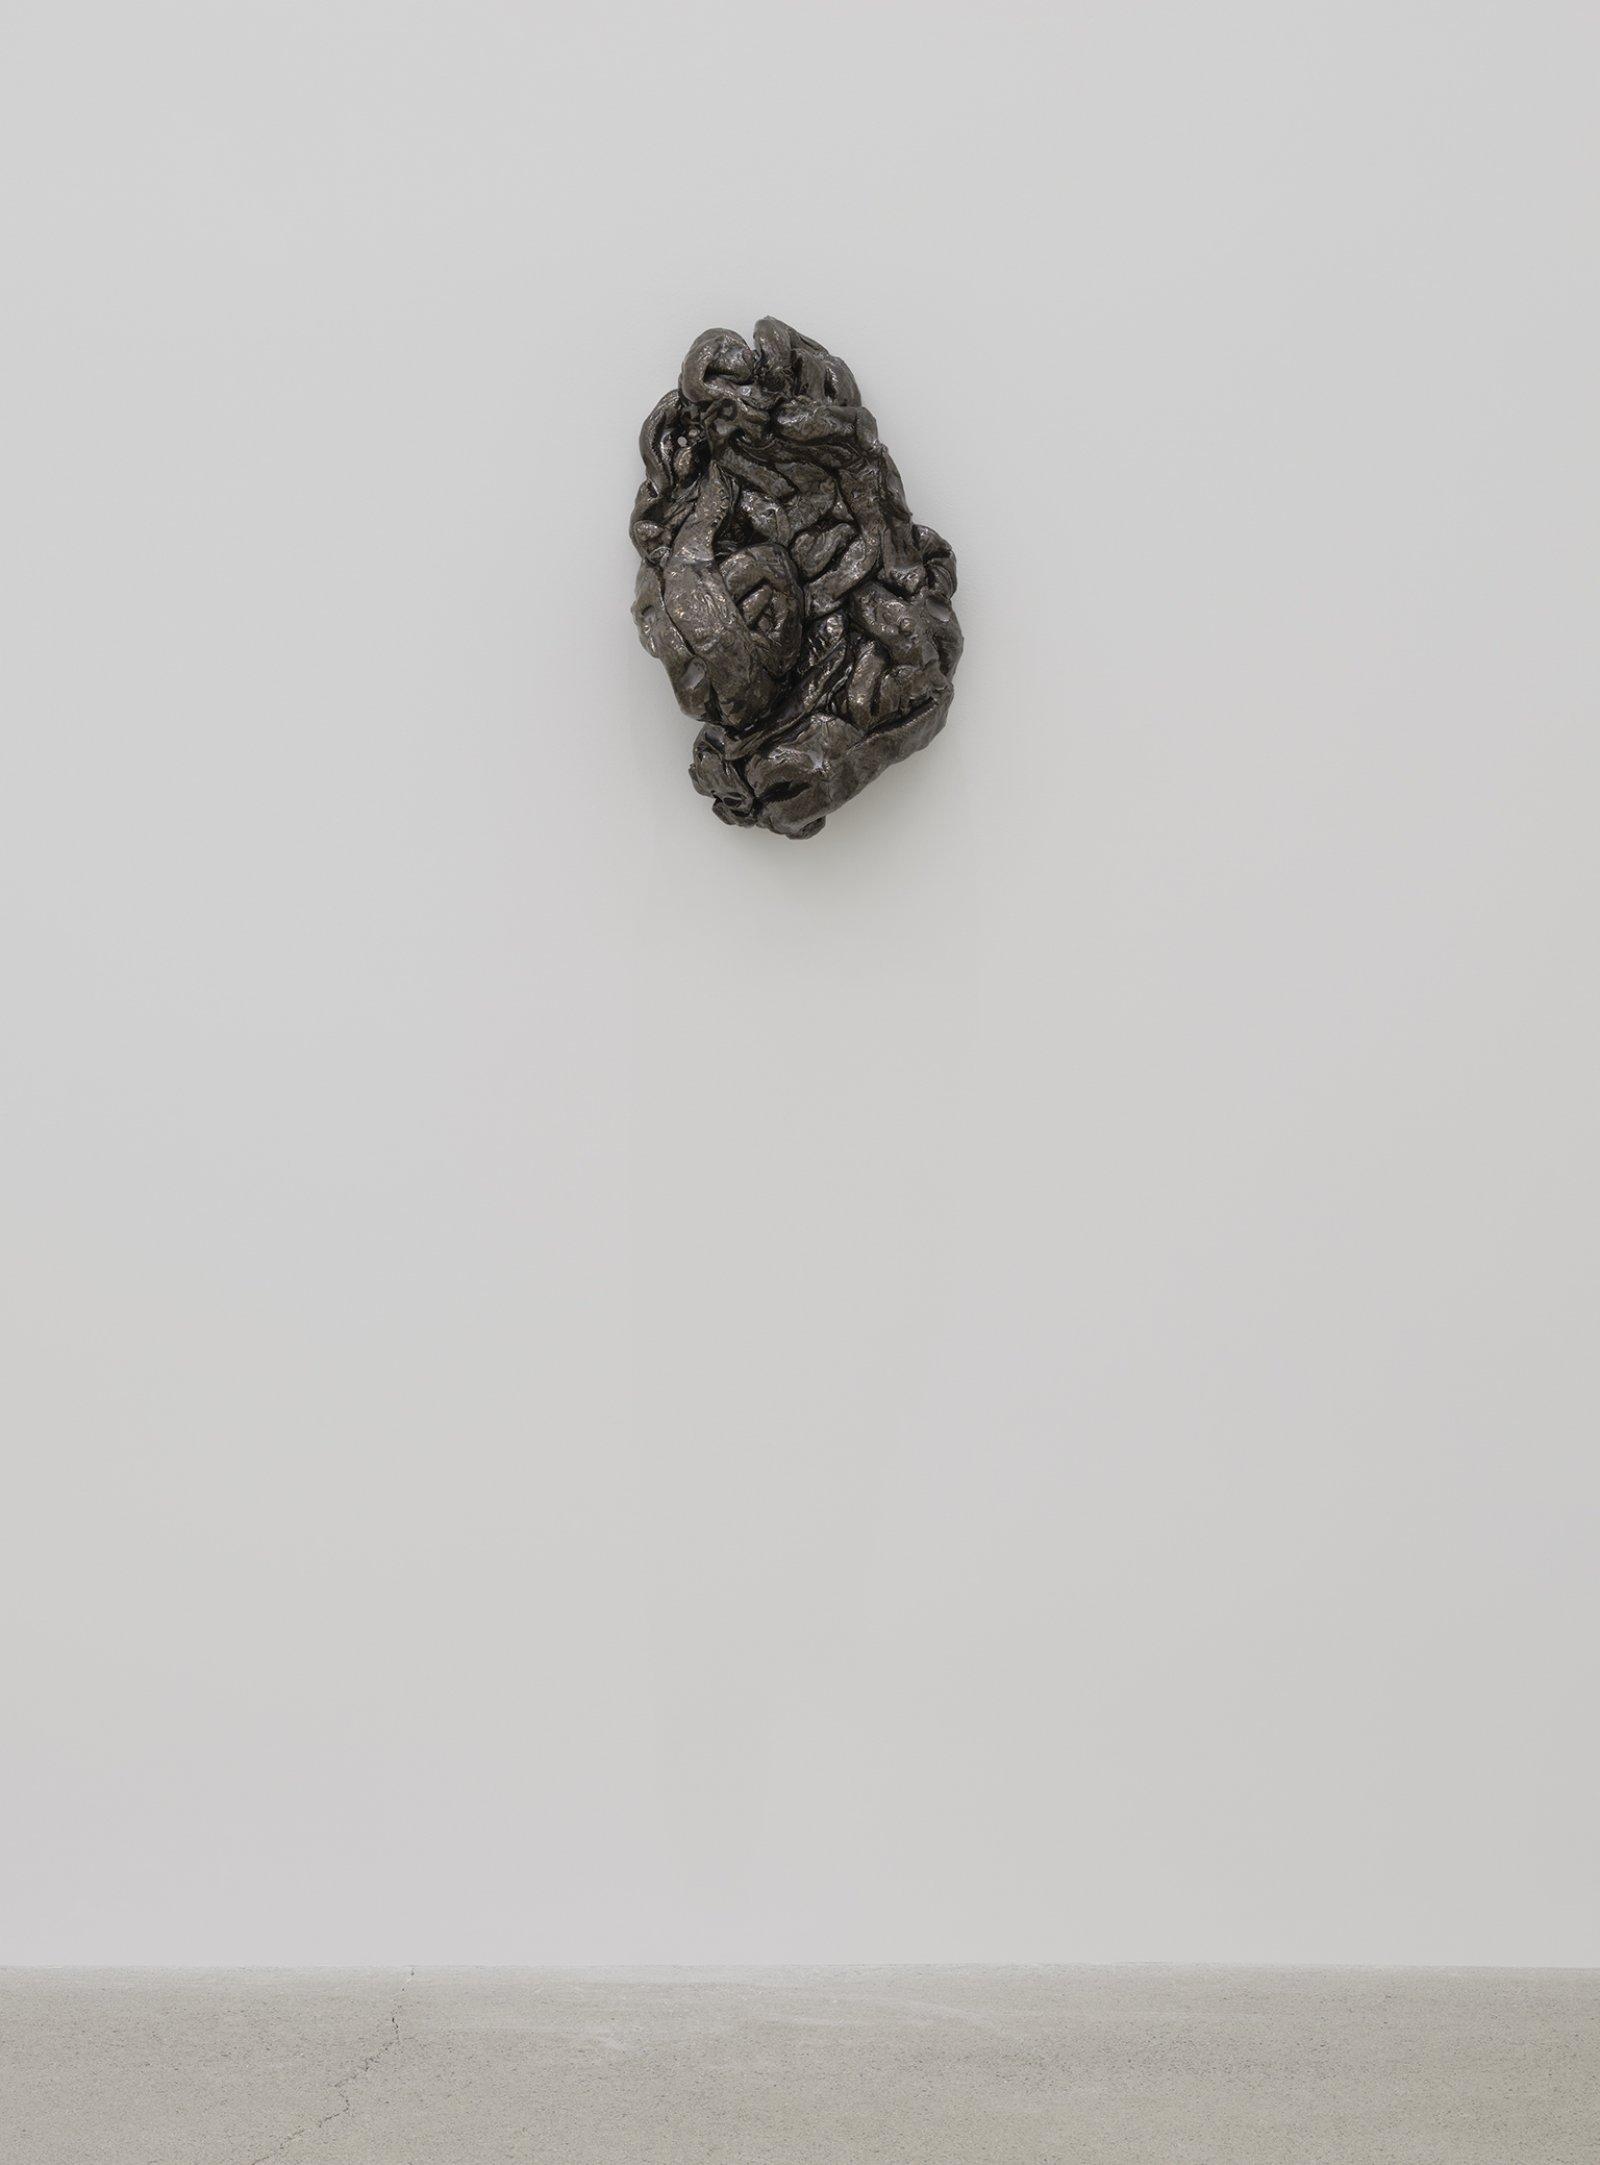 Rochelle Goldberg, Composite Contact II, 2019, glazed ceramic, nails, 18 x 12 x 7 in. (46 x 31 x 18 cm) by Rochelle Goldberg